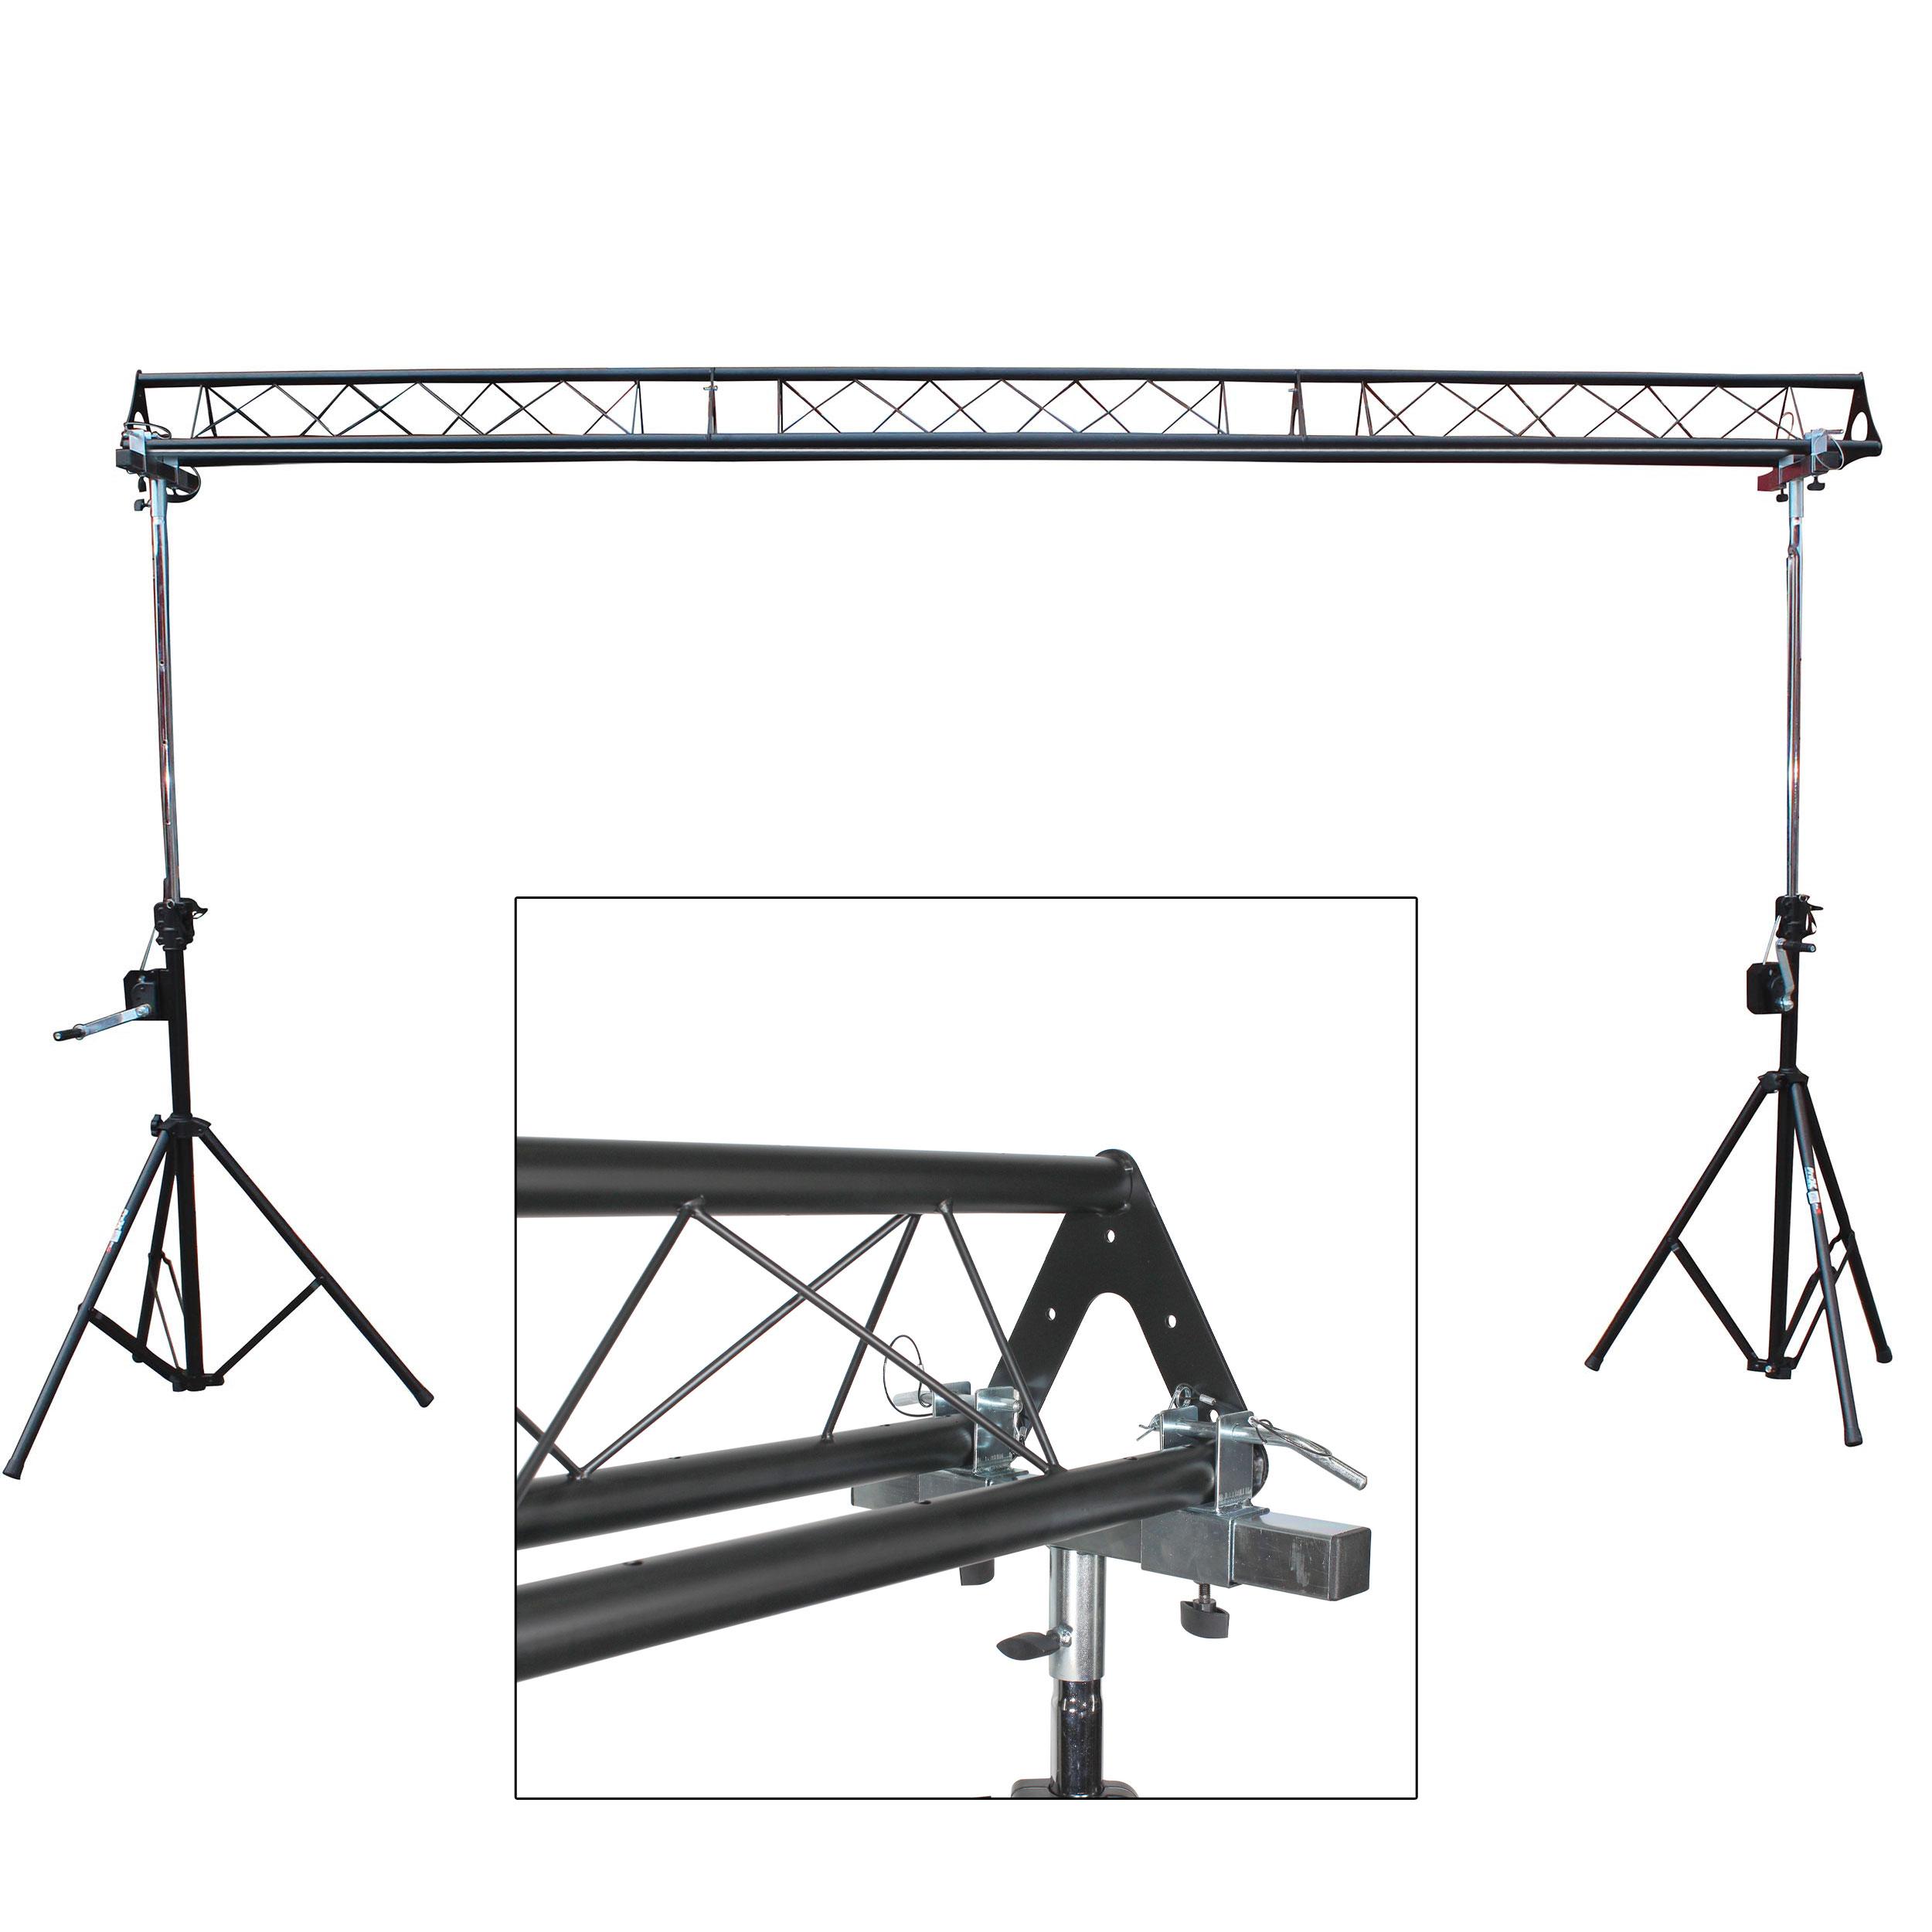 prox-t-ls35vc-dj-production-crank-up-lighting-system.jpg